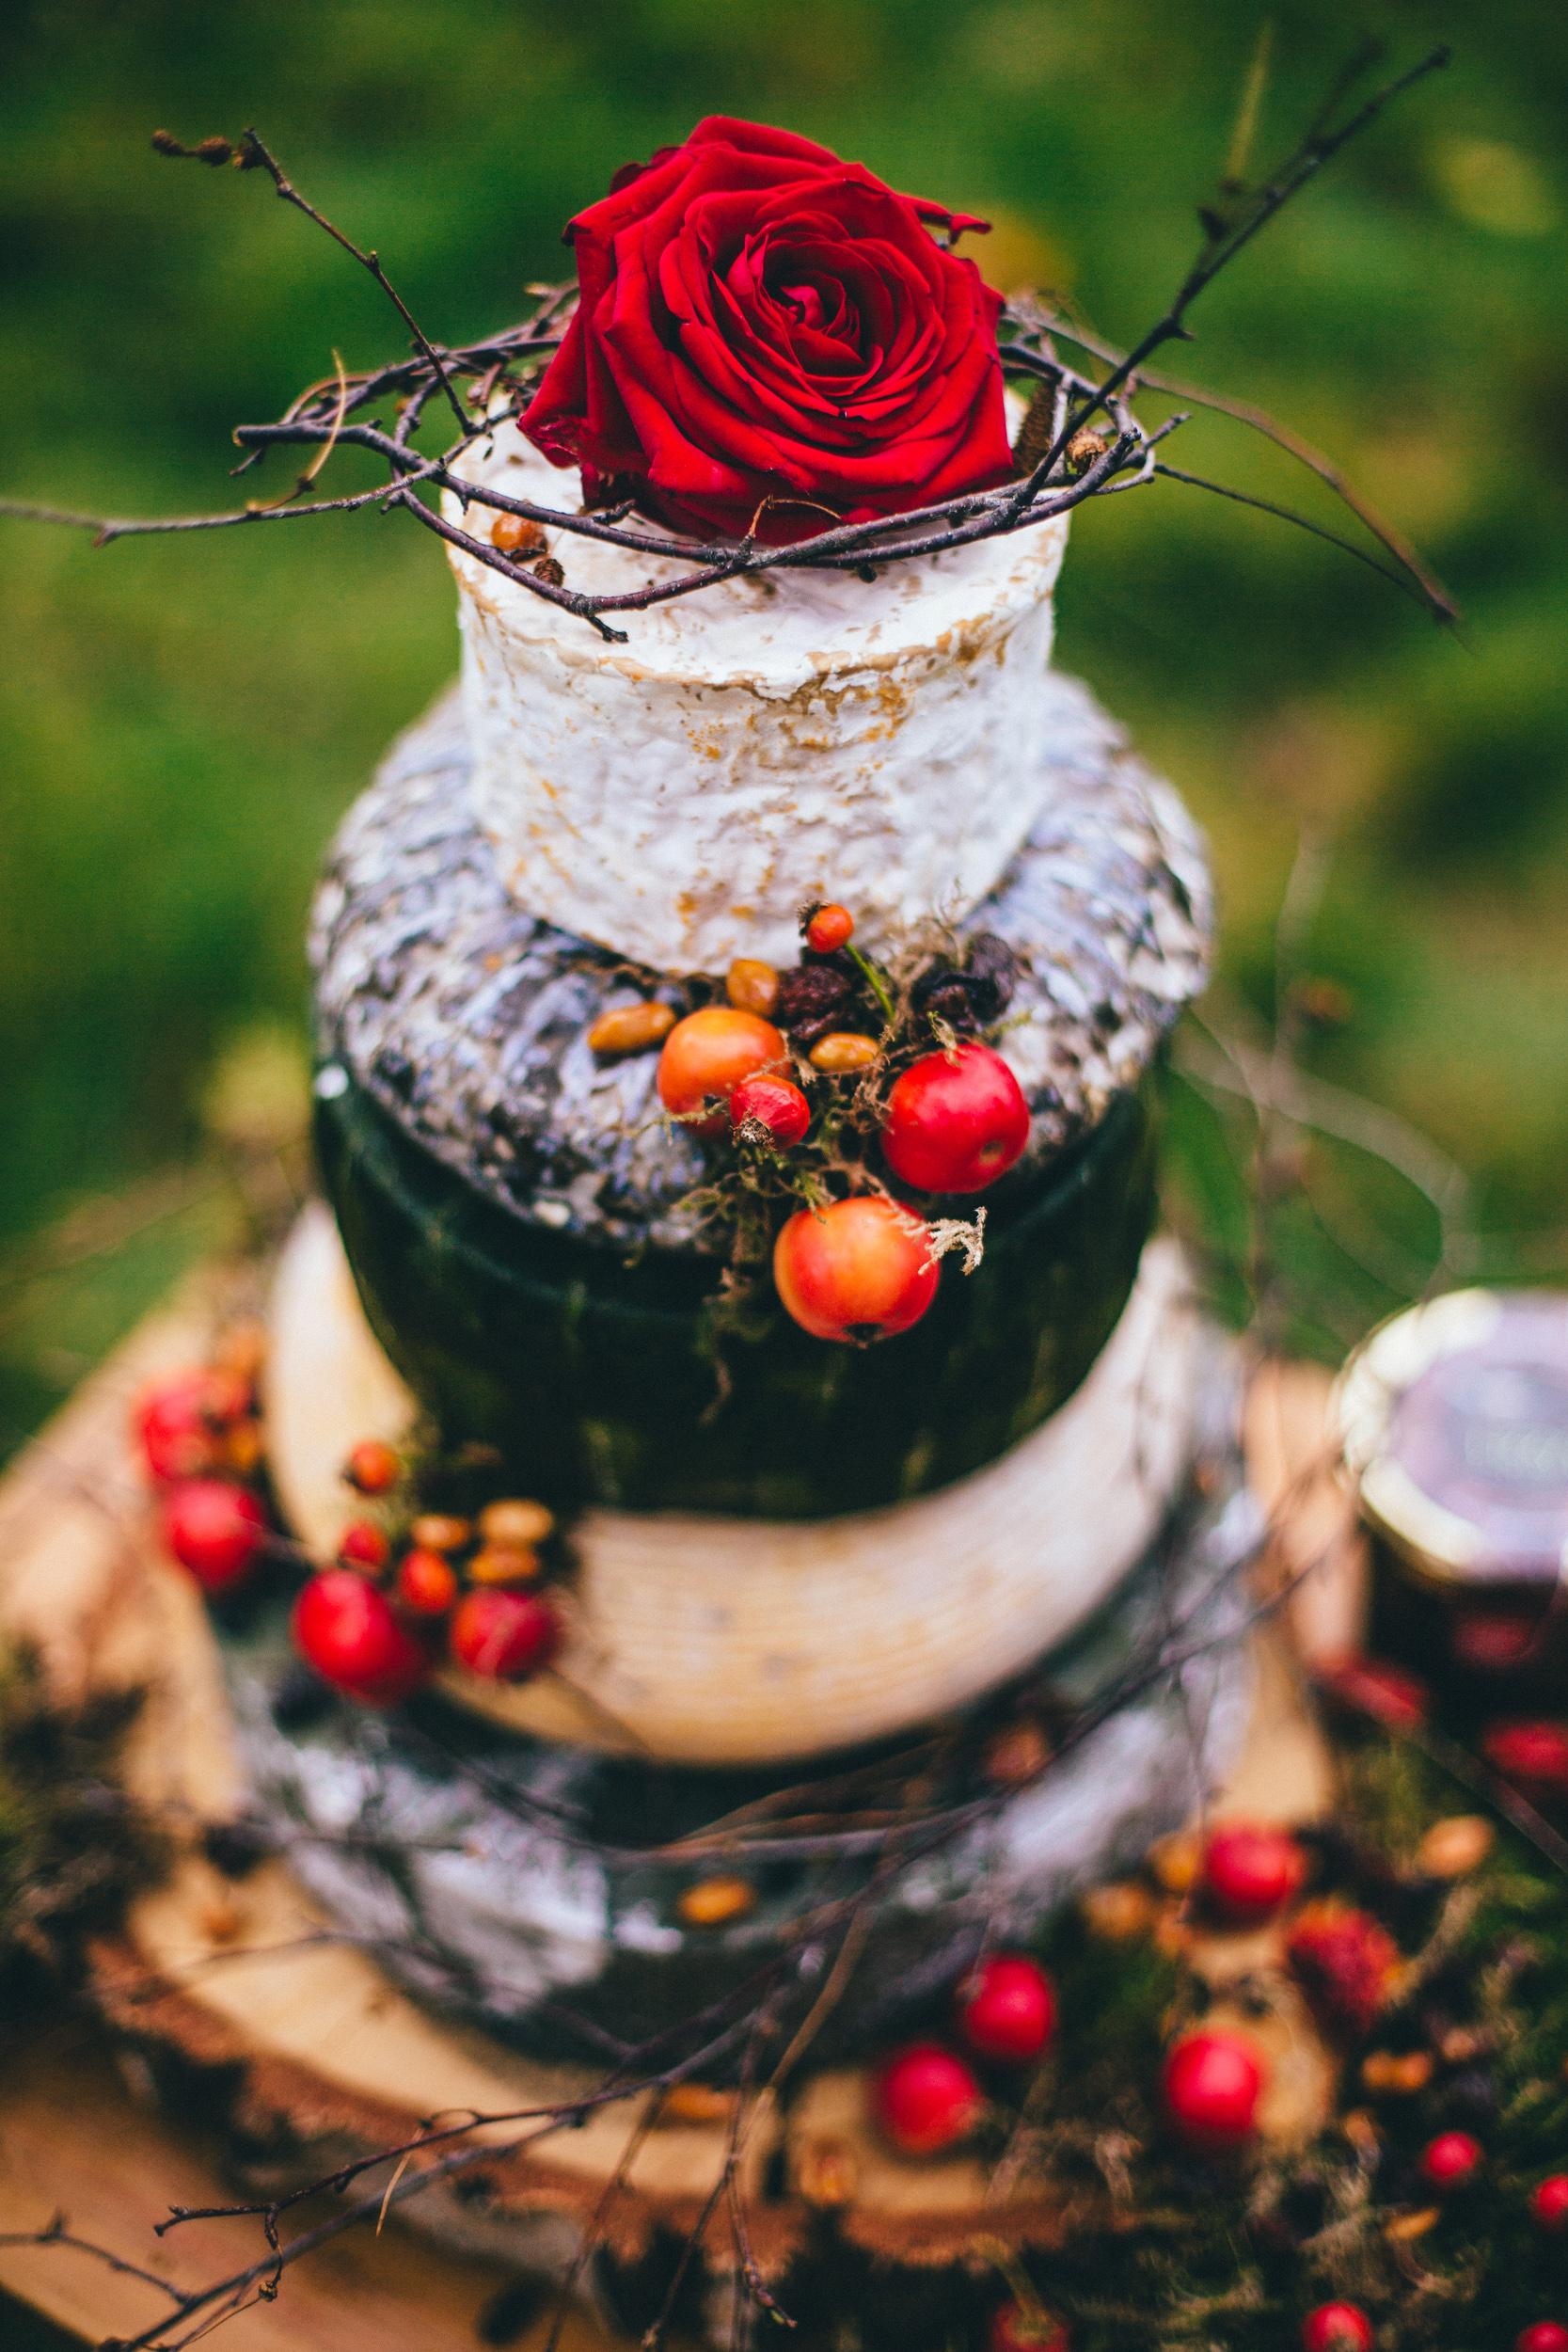 Kate-Beaumont-Wedding-Dresses-Autumn-Shoot-Rebecca-Tovey-11.jpg